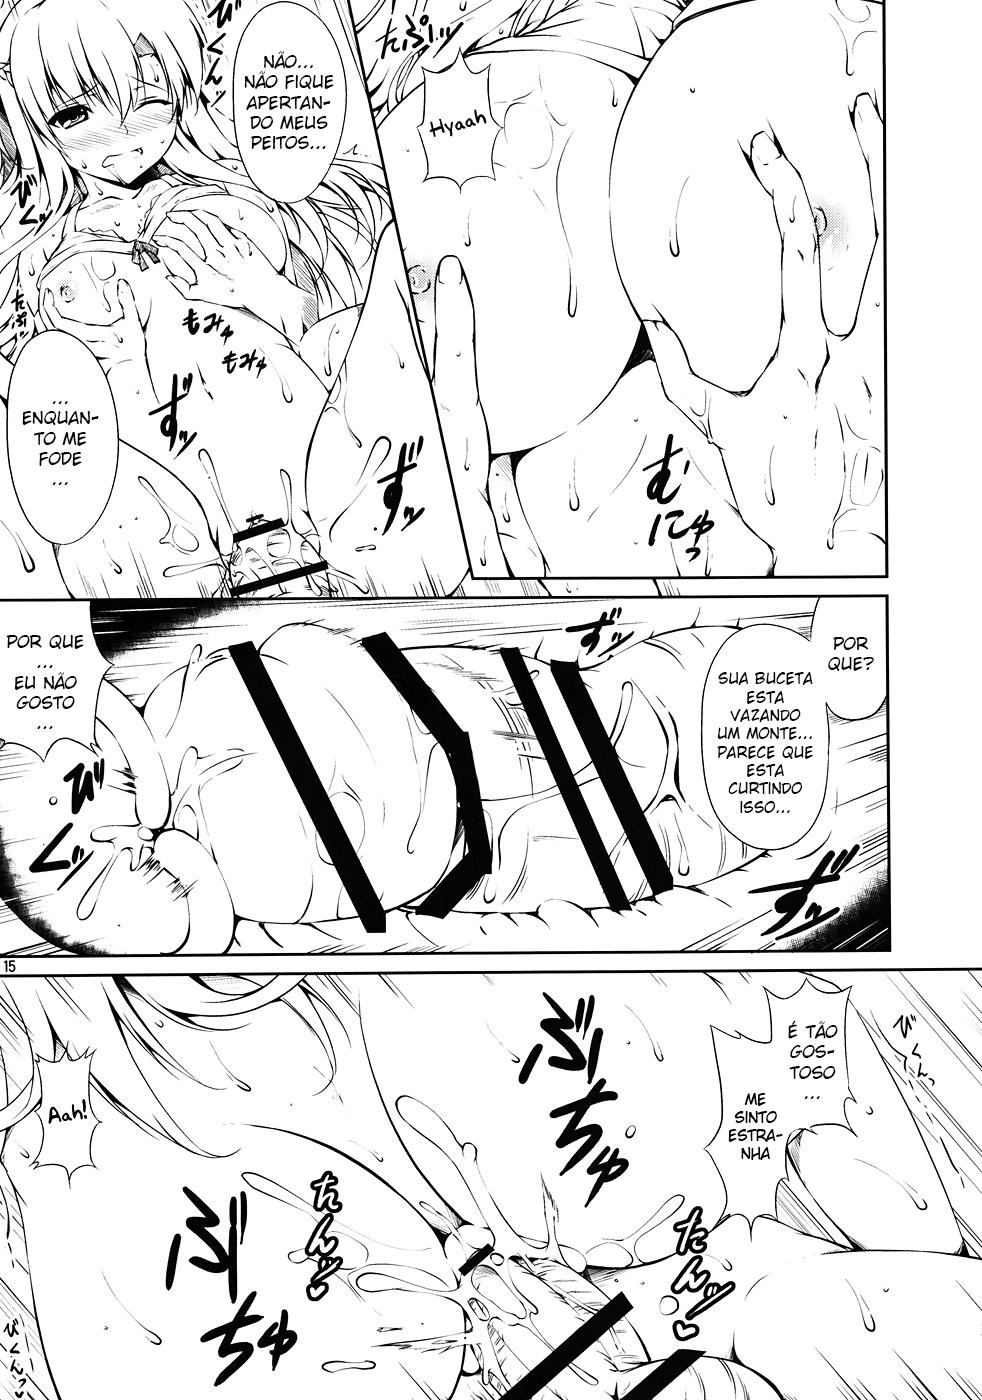 sword art online asuna hot xxx 18 - Sword Art Online - Kirito & Asuna Hentai HQ